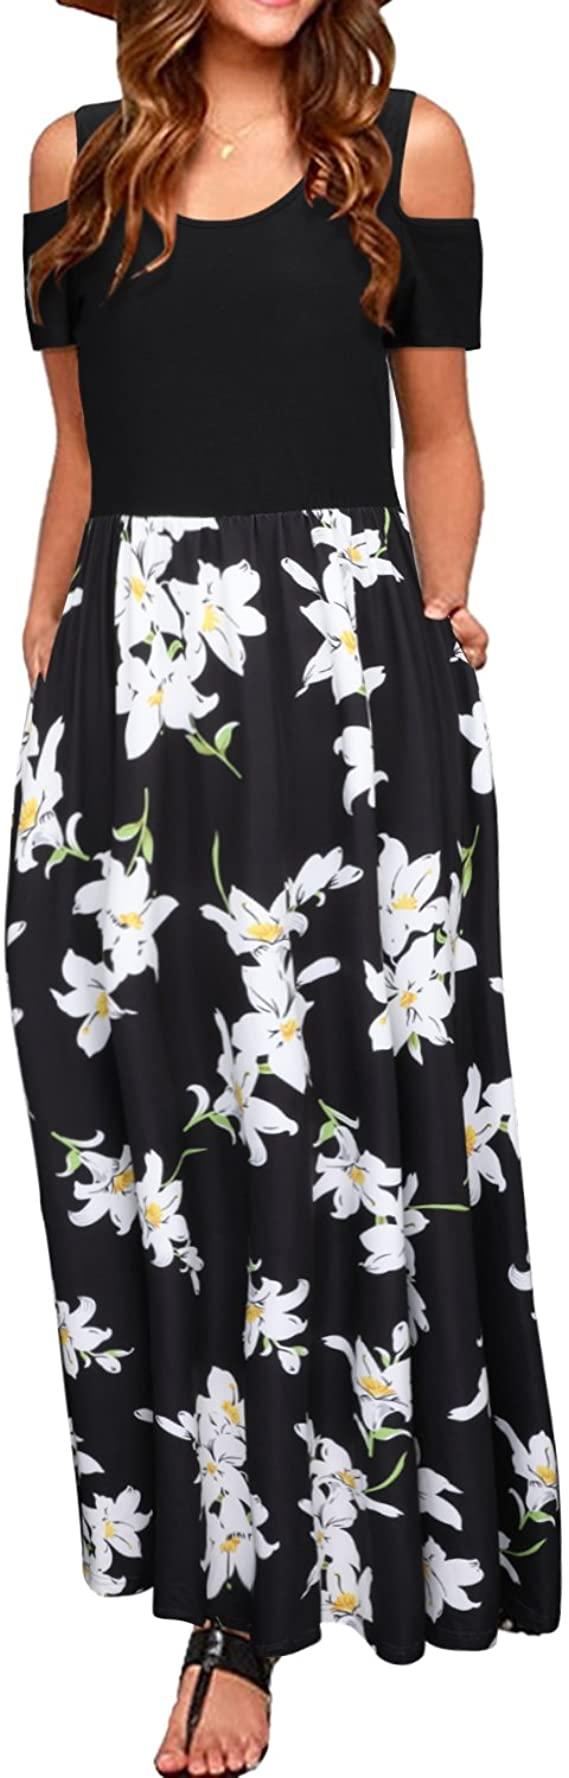 woman wearing a long skirt